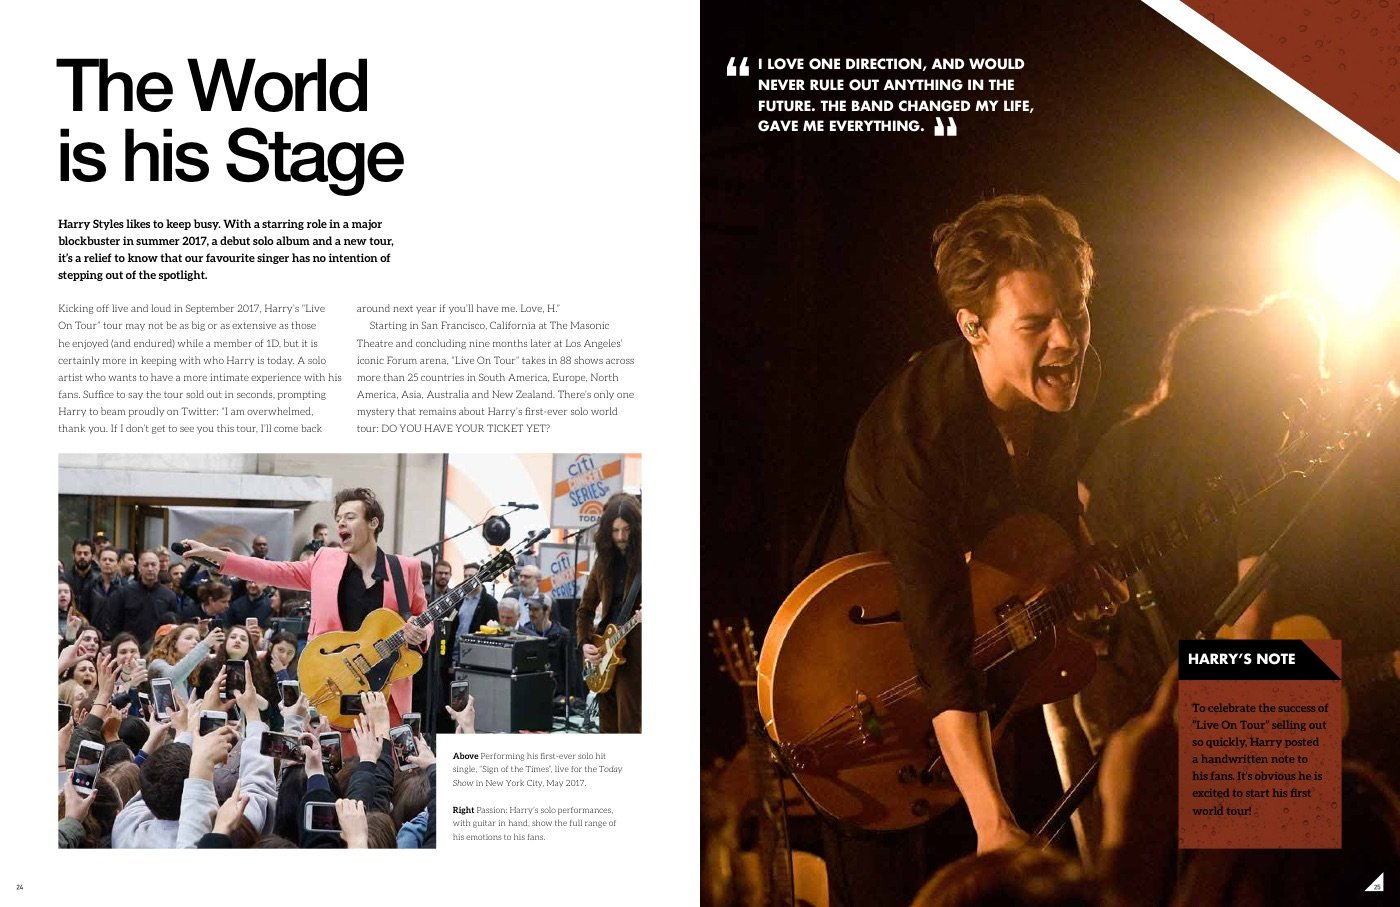 Harry Styles: Evolution of a Modern Superstar